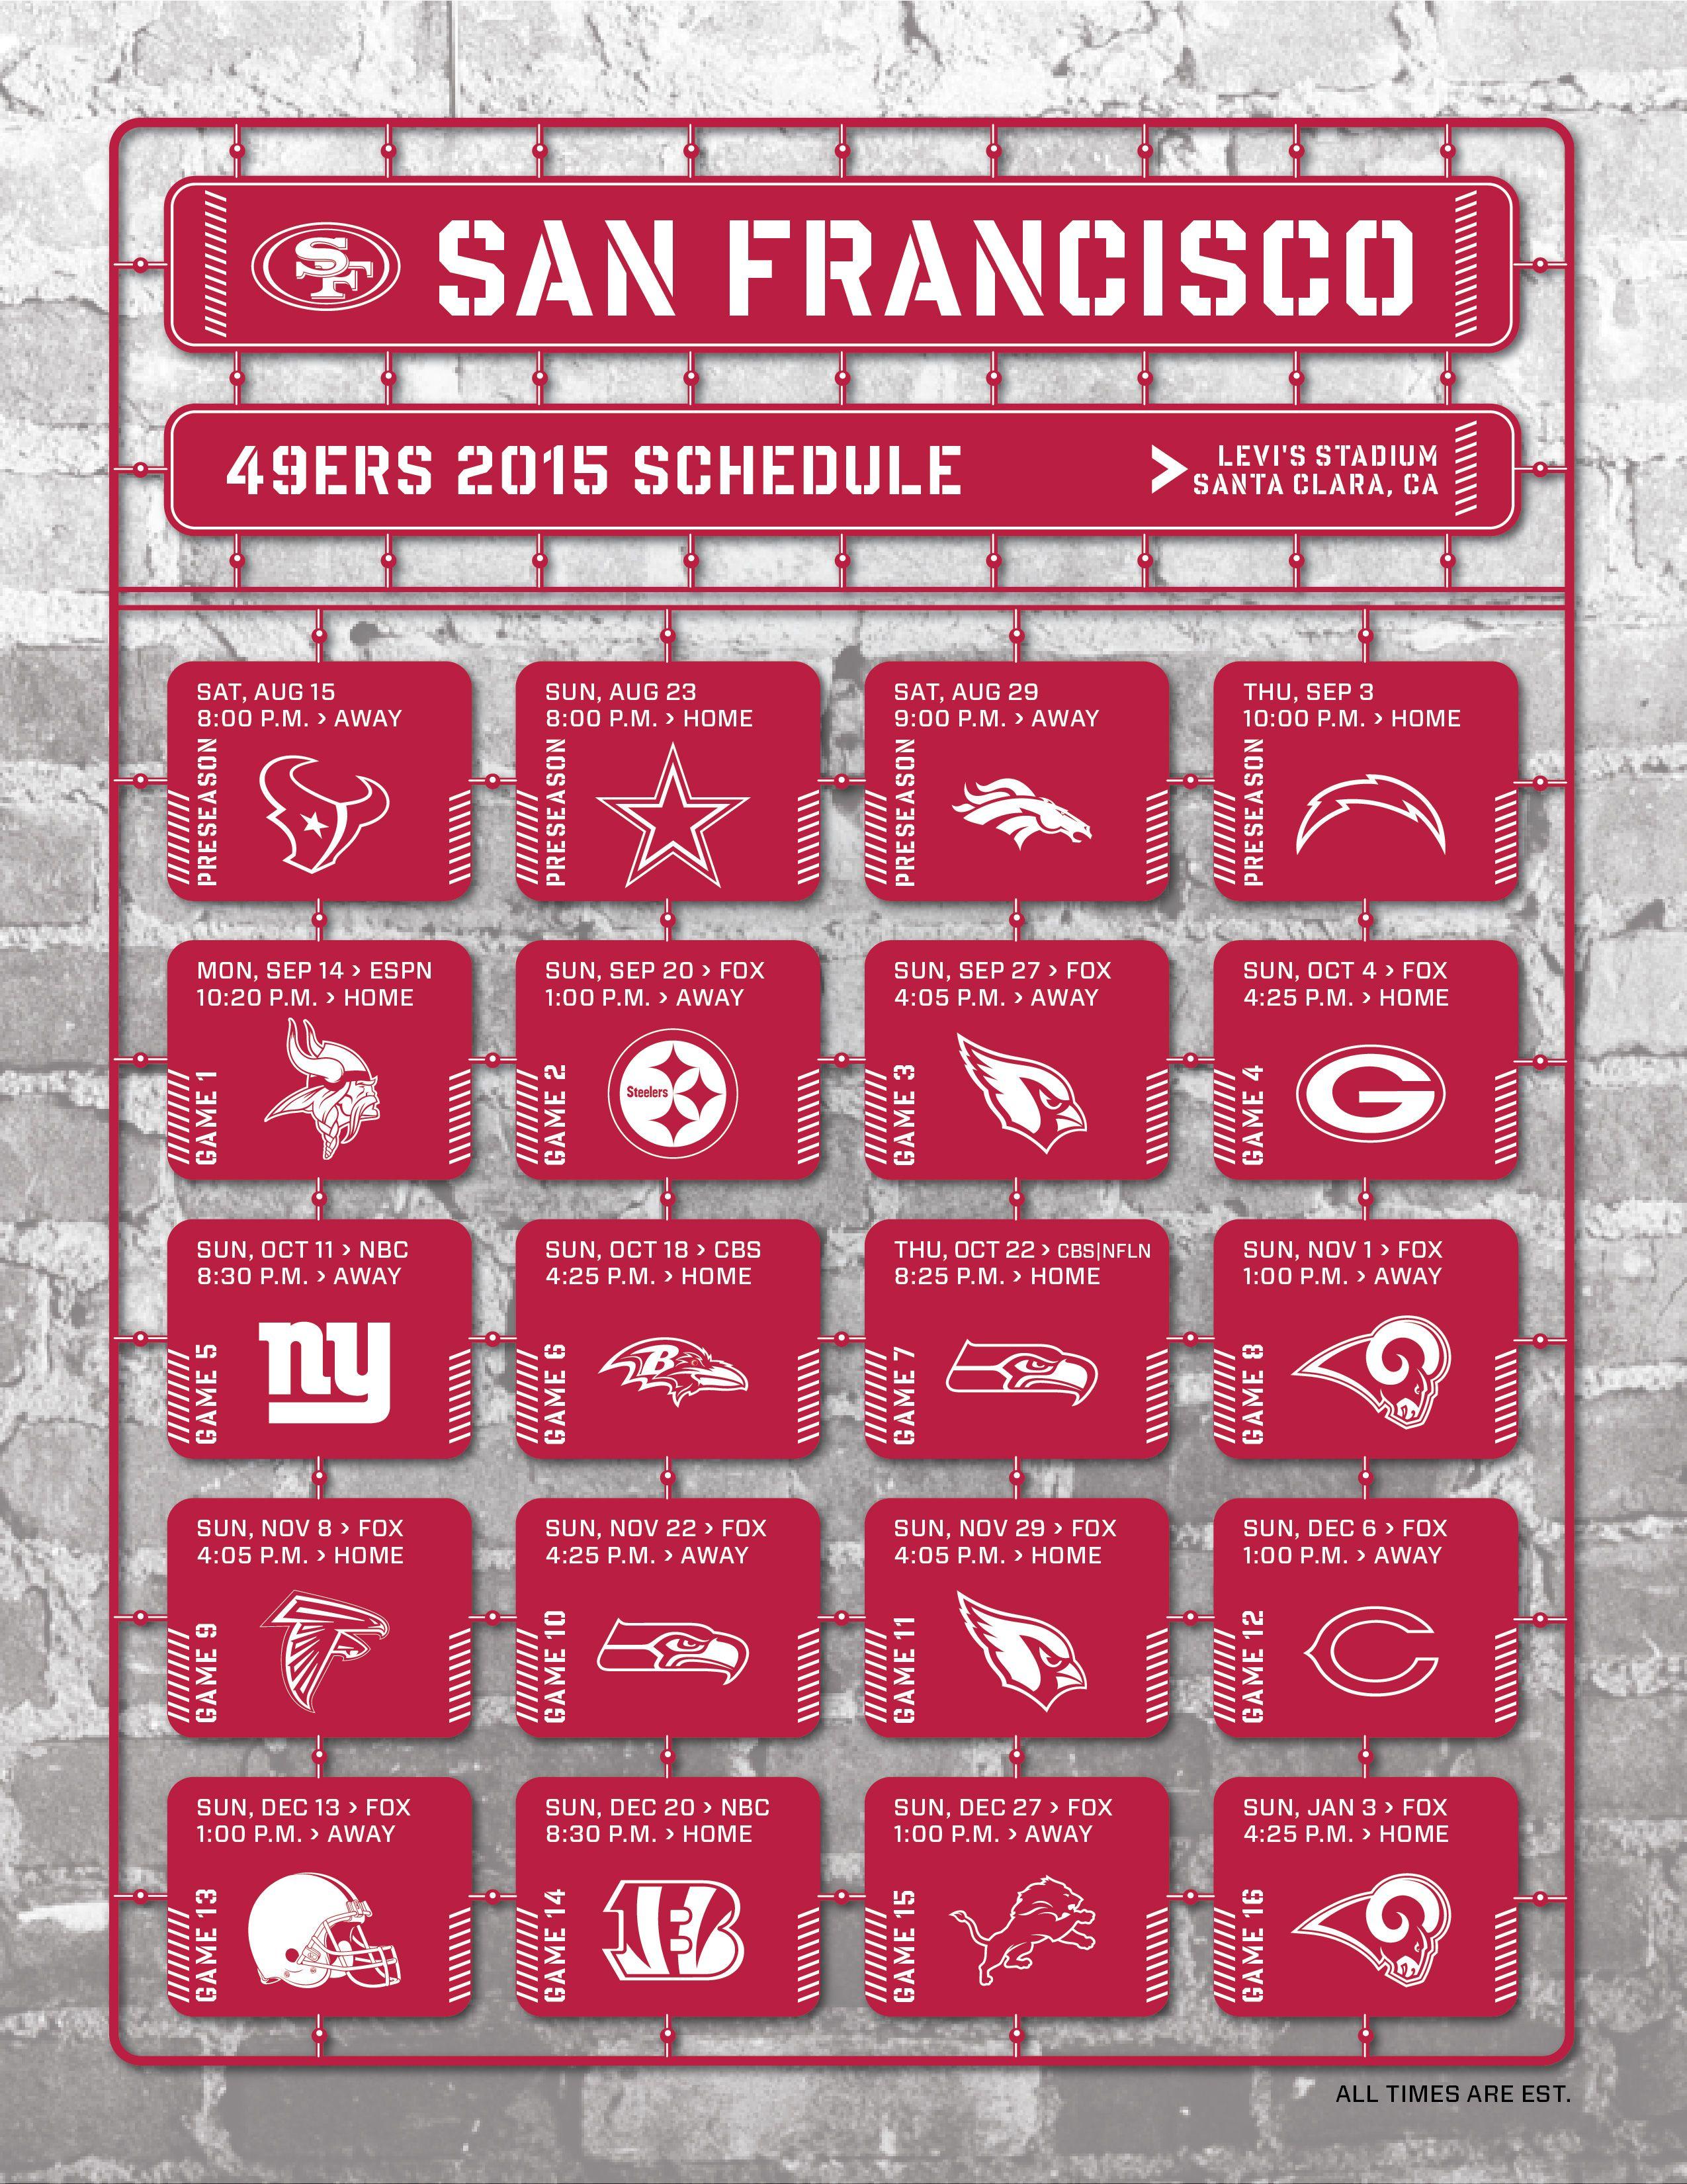 San Francisco 49ers 2015 Schedule Atlanta Falcons Schedule Atlanta Falcons San Francisco 49ers